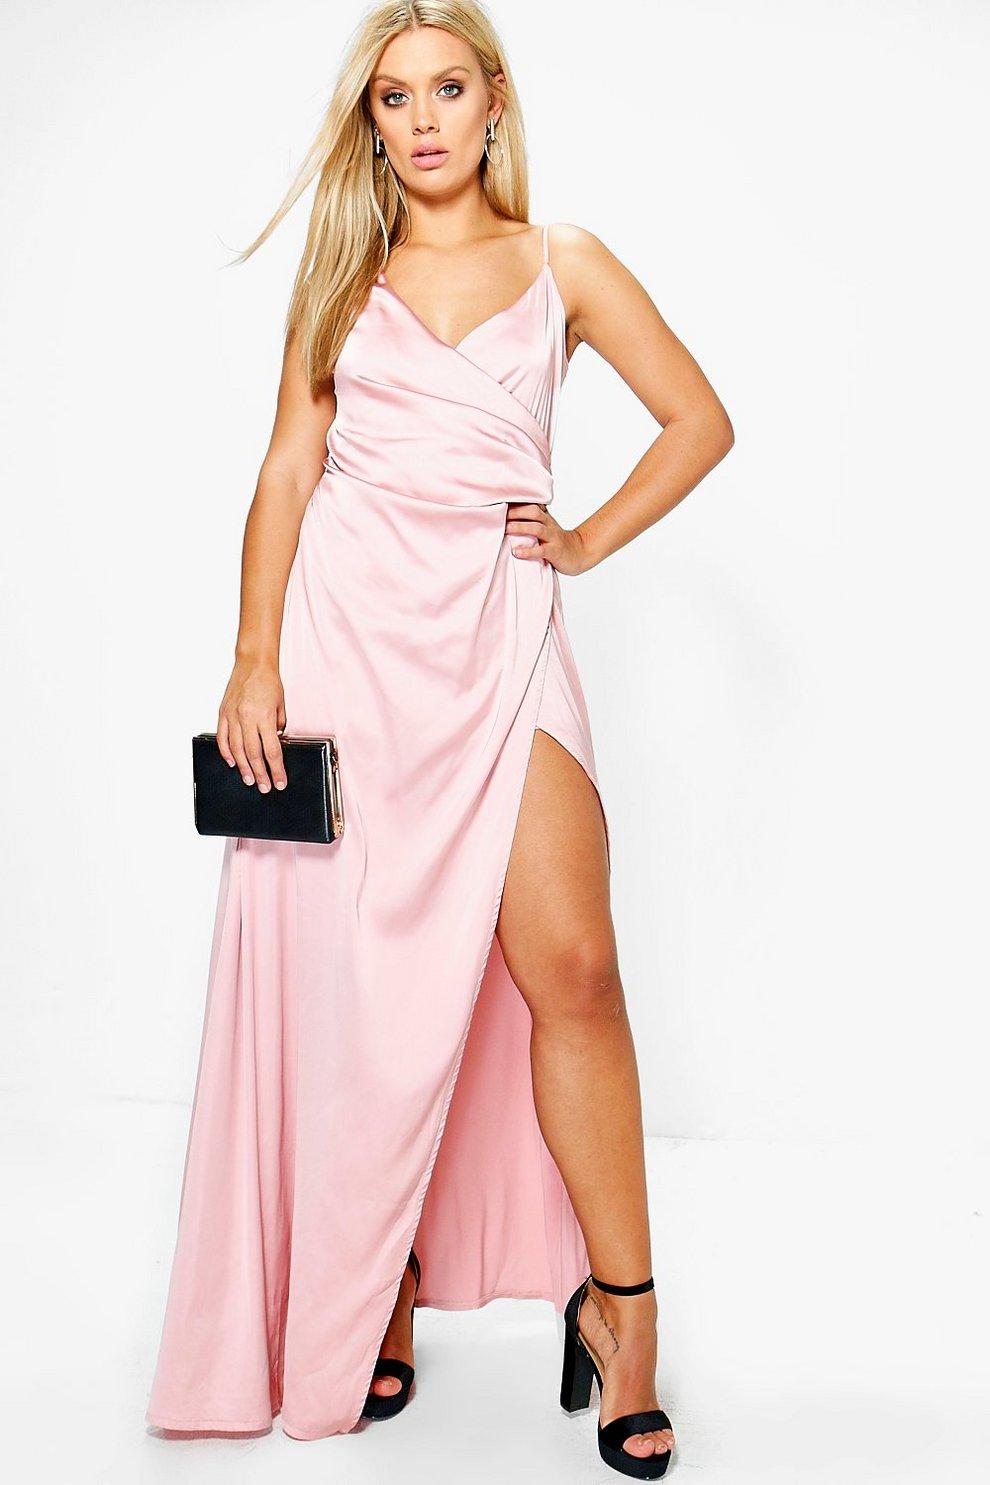 ace46add265 Womens Blush Jordyn Satin Wrap Maxi Dress